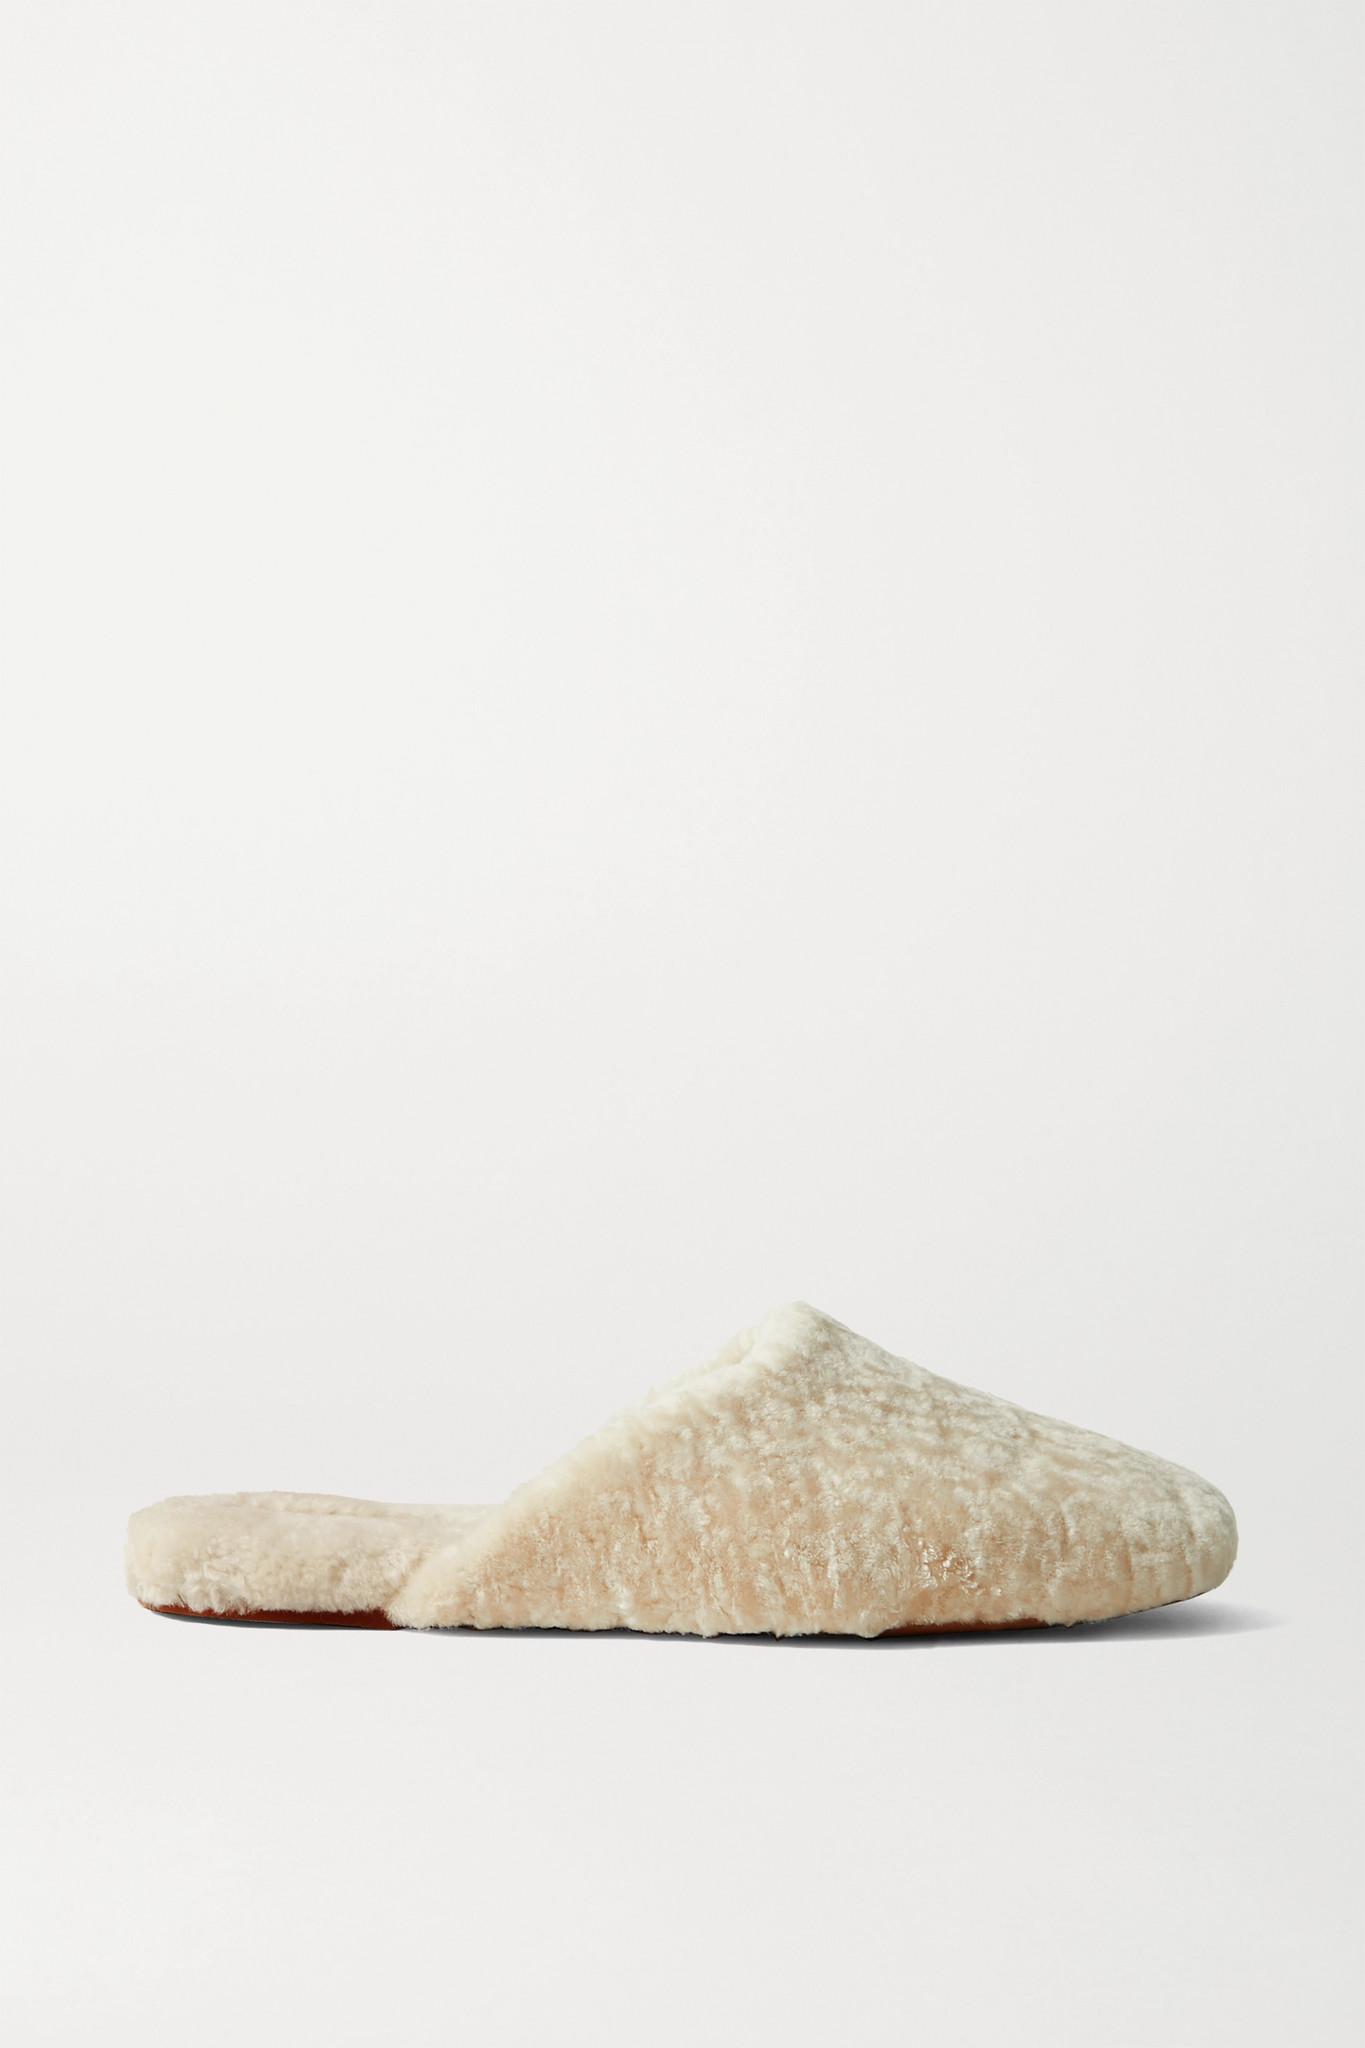 VINCE - Caela 羊毛皮拖鞋 - 奶油色 - US6